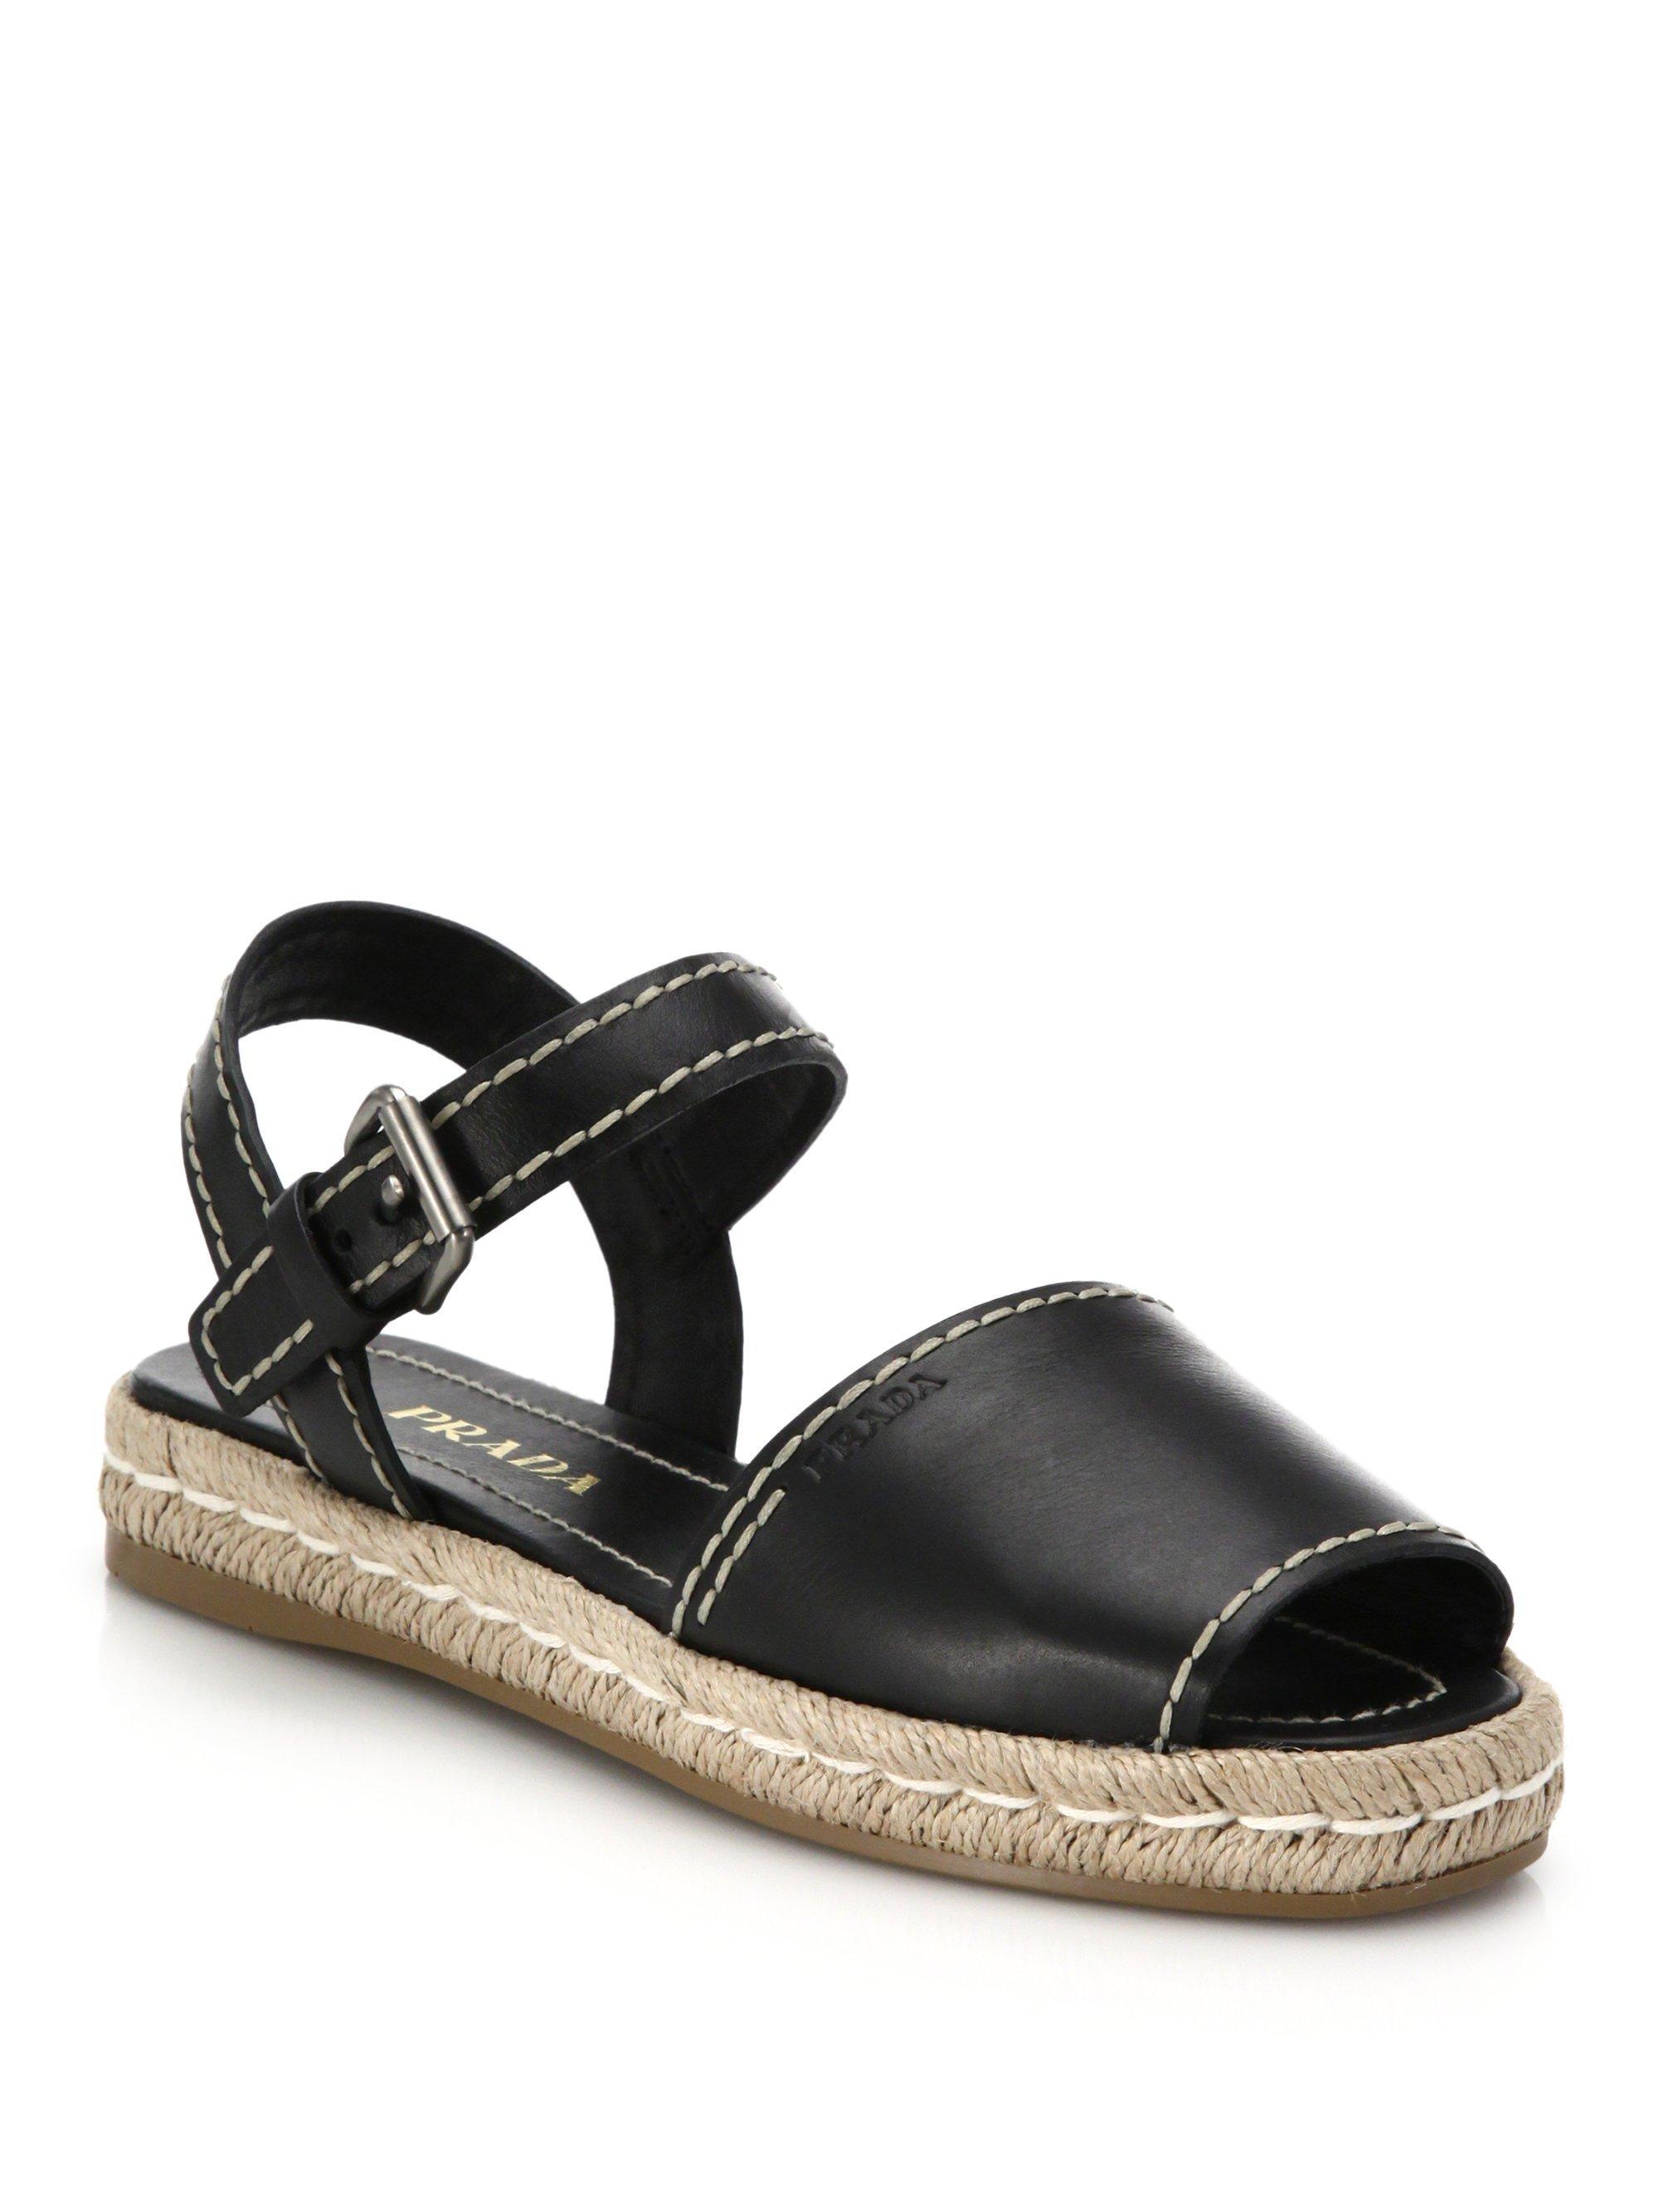 Prada Leather Espadrille Sandals In Black Lyst